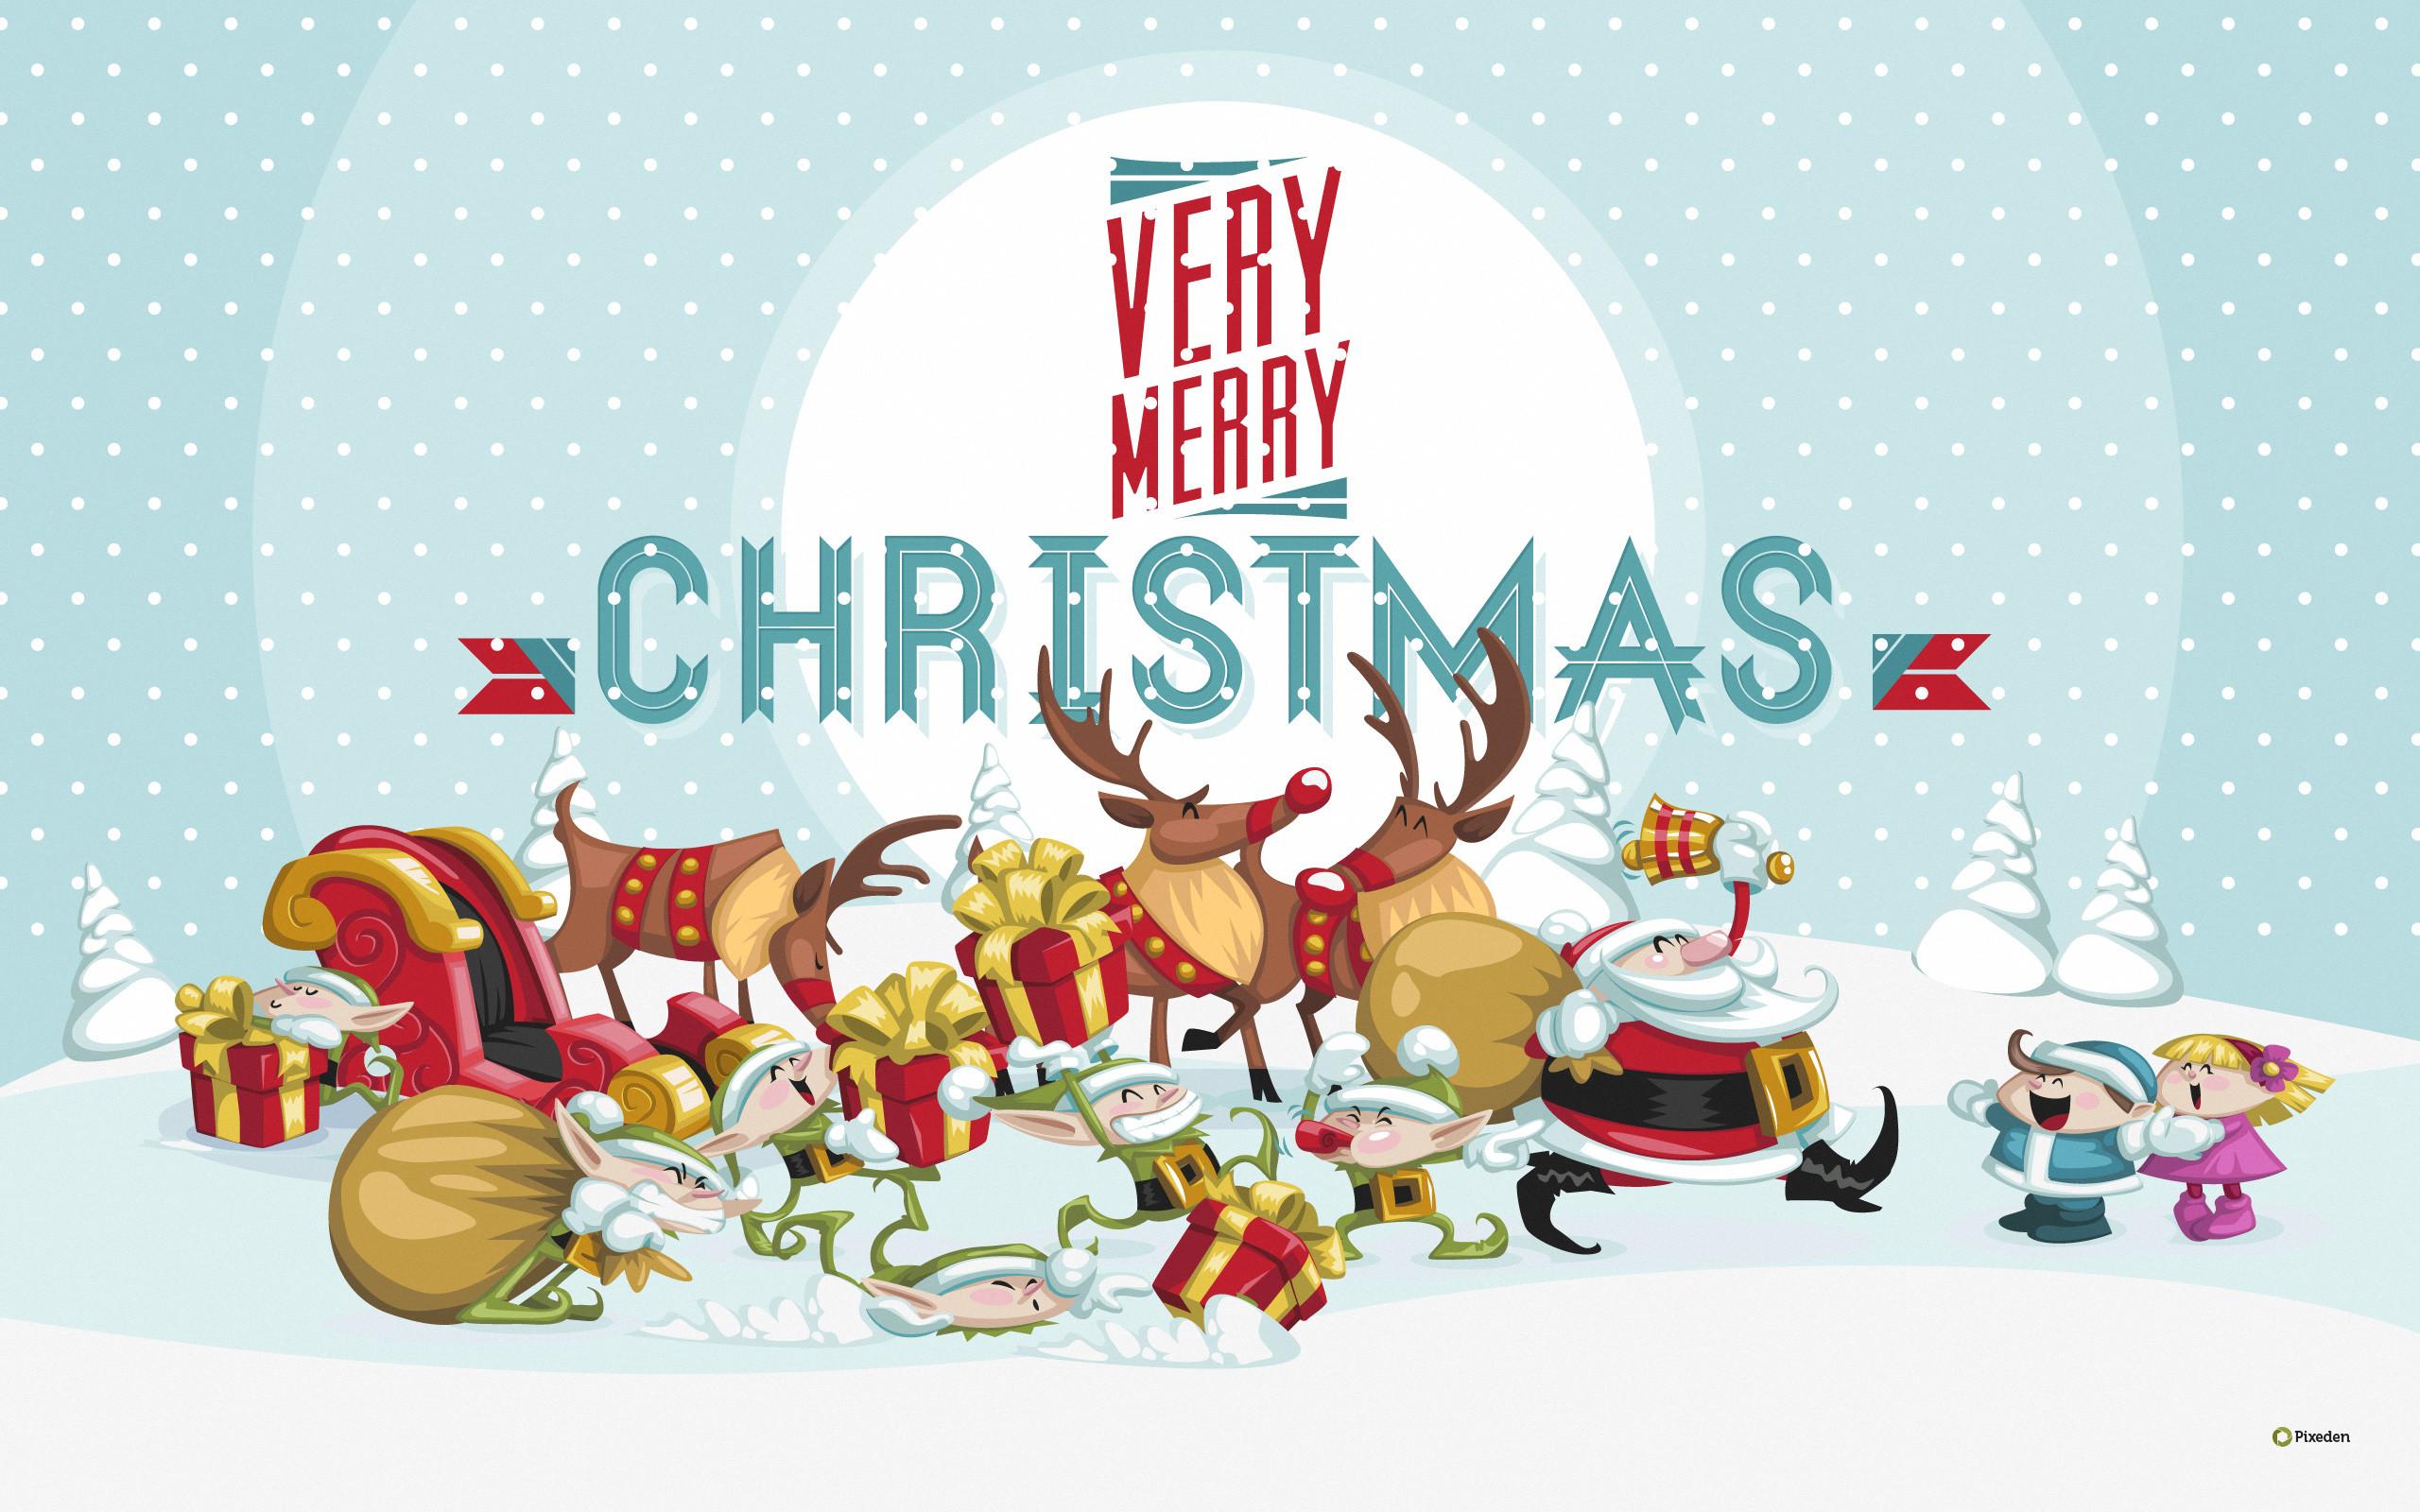 2017 Merry Christmas Wallpaper